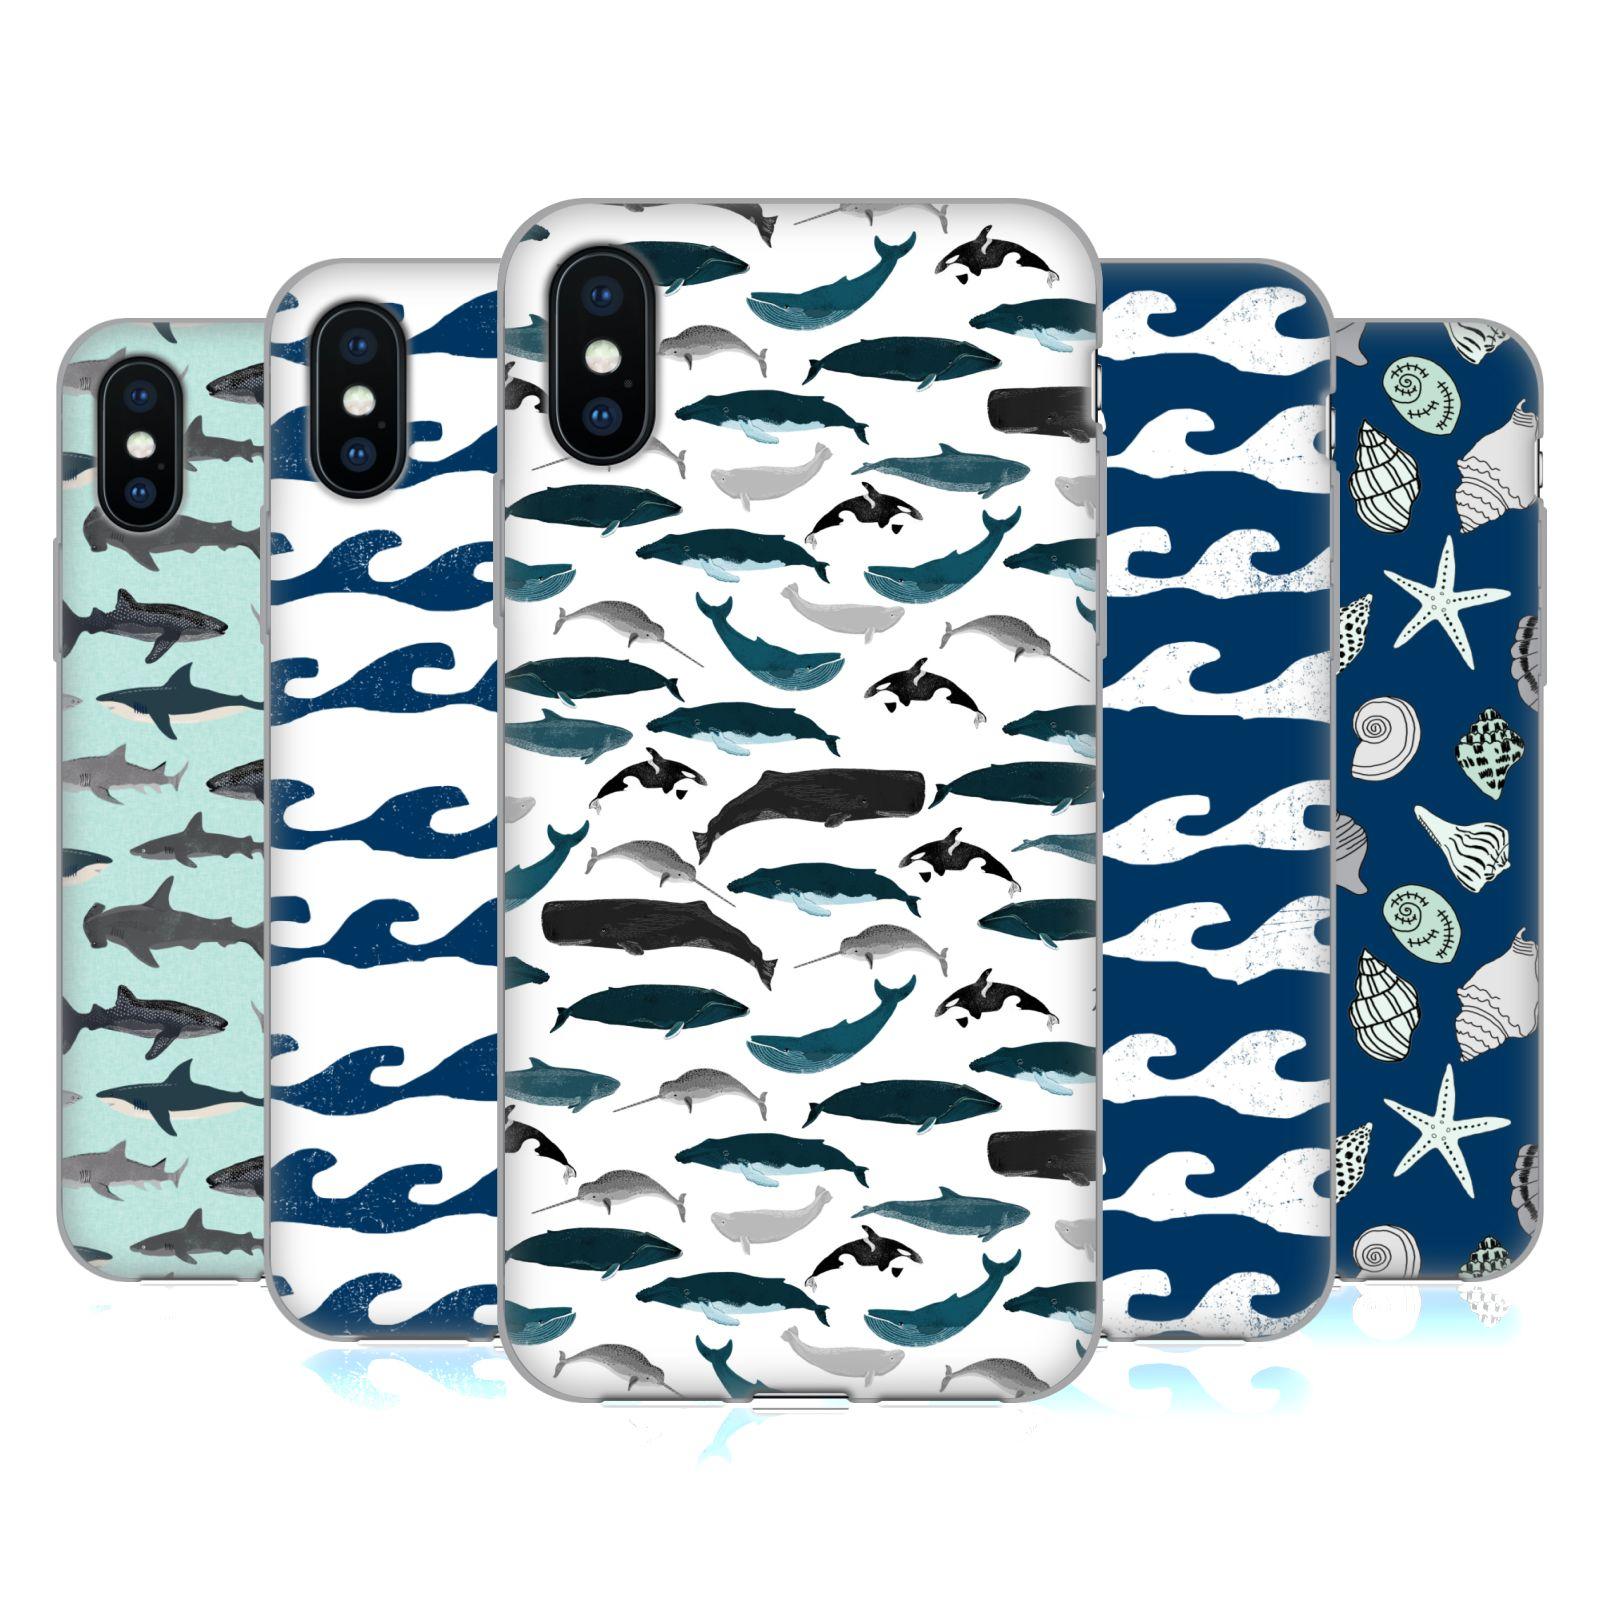 Andrea Lauren Design <!--translate-lineup-->Sea Life<!--translate-lineup-->